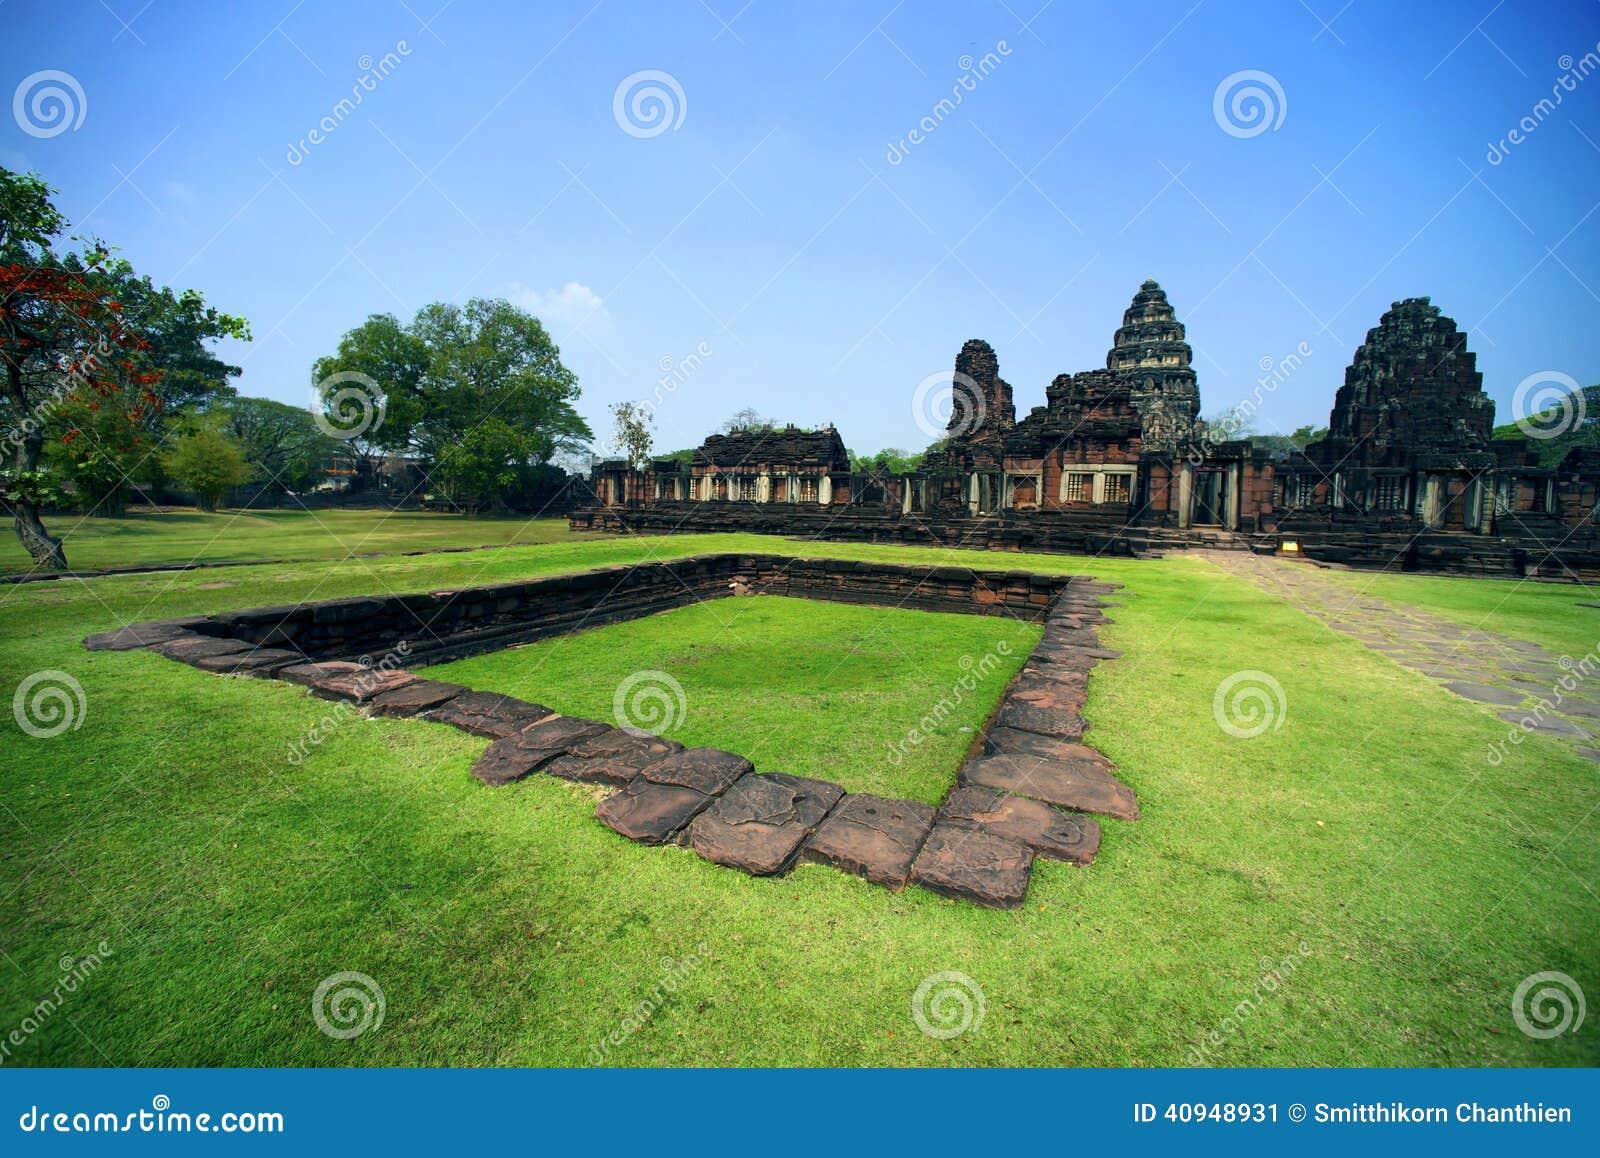 Antico al parco storico di Phimai, Tailandia